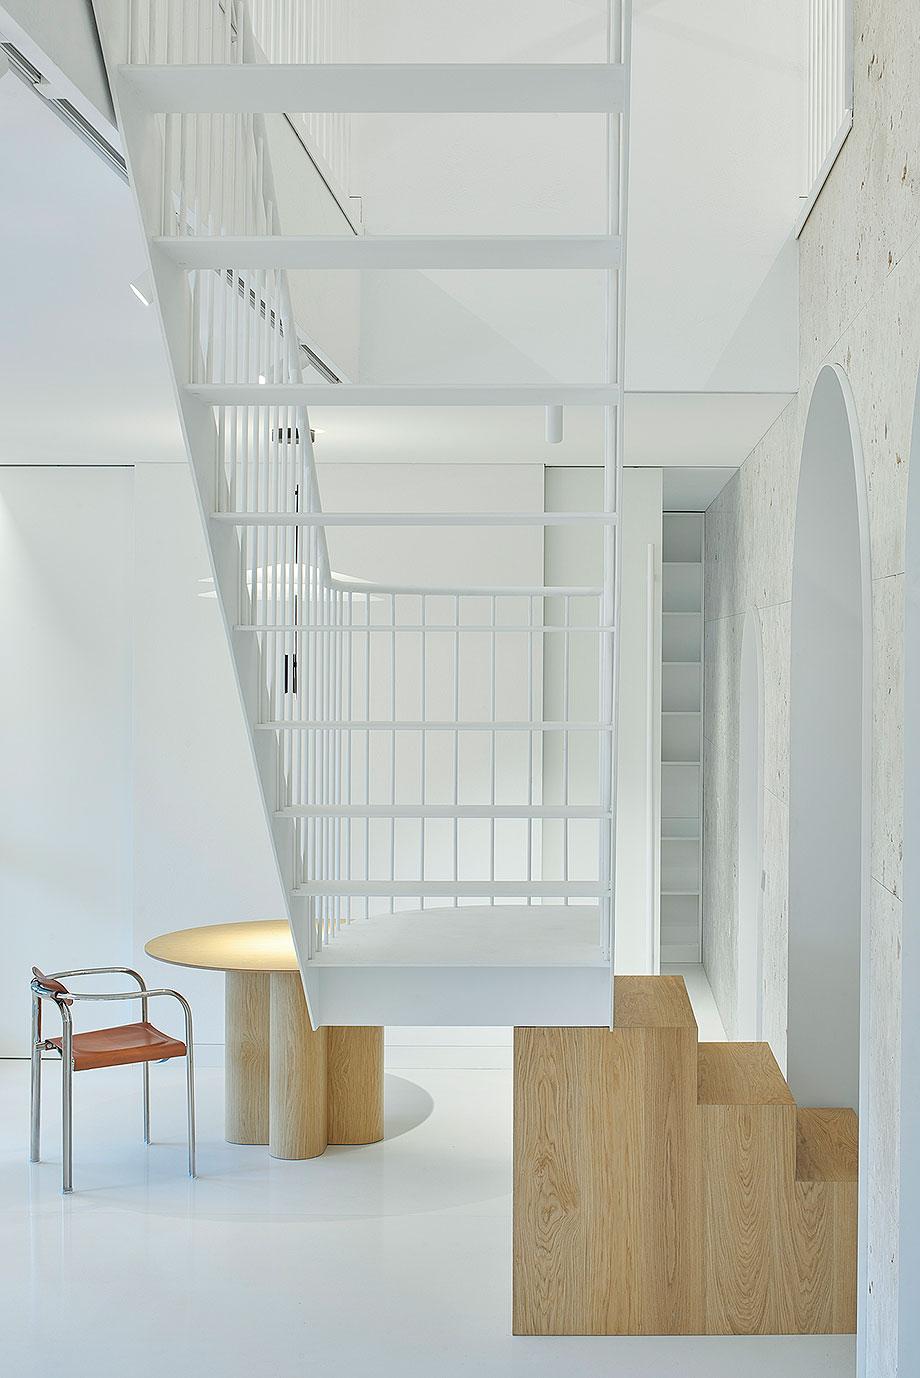 apartamento con un muro de piedra revestido con travertino por 2xj architects (4) - foto darius petrulaitis